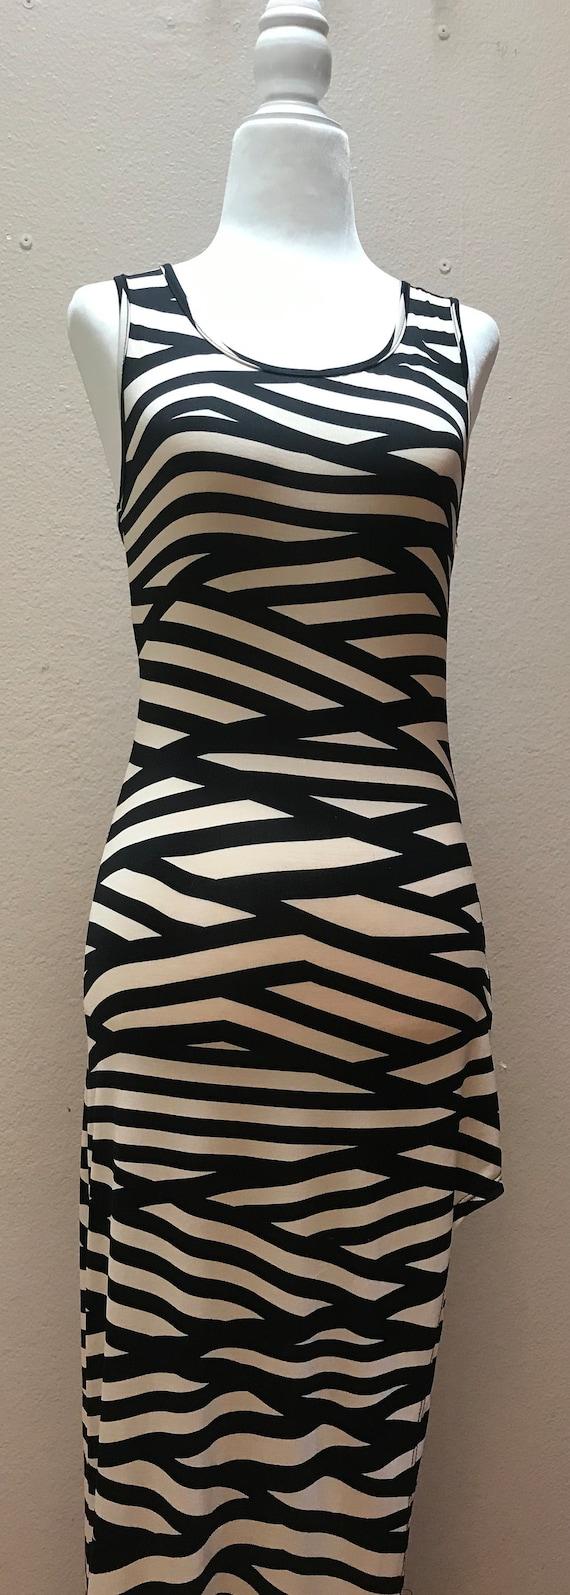 Vintage 1990's black and cream striped dress